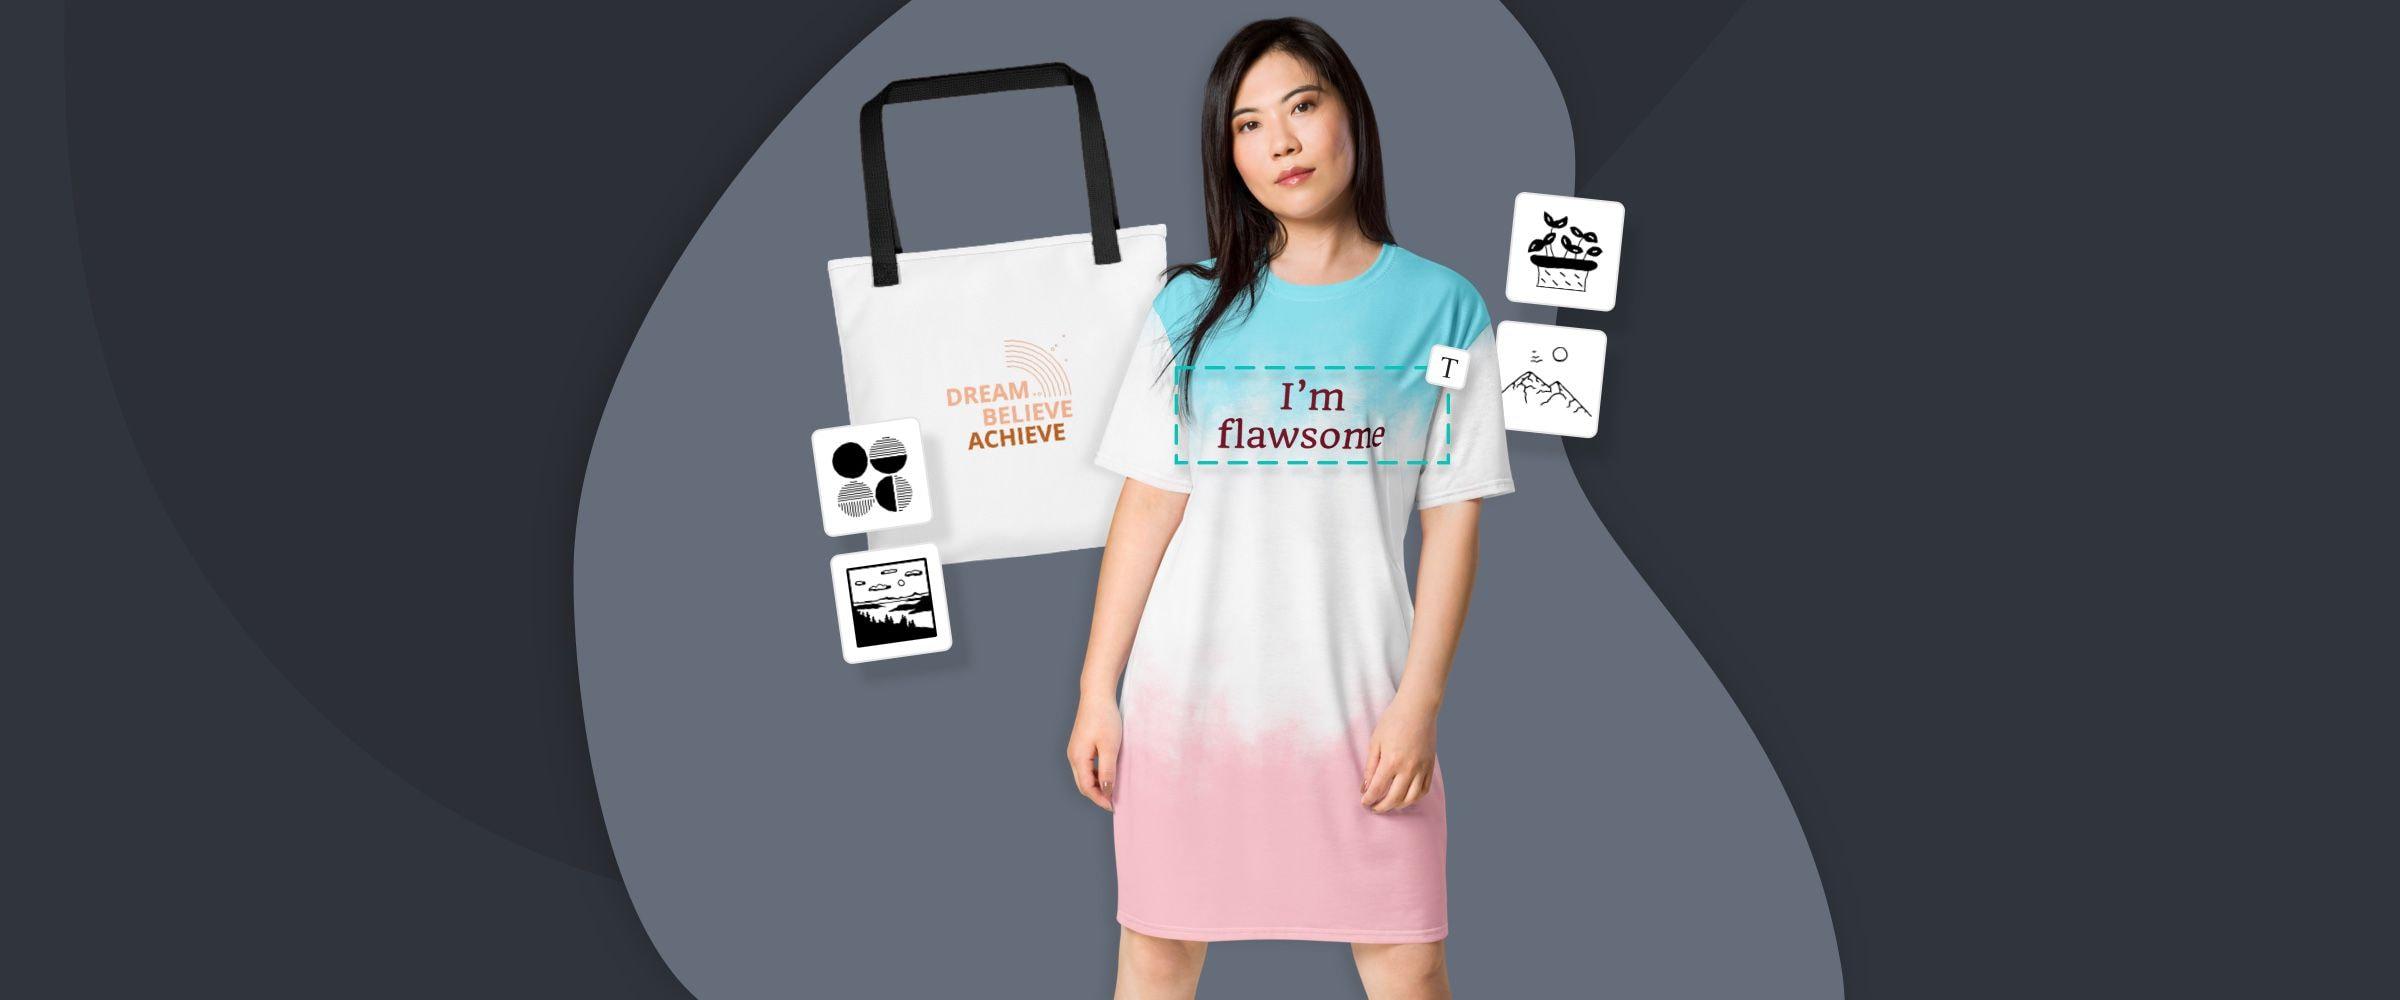 custom printed merchandise on demand